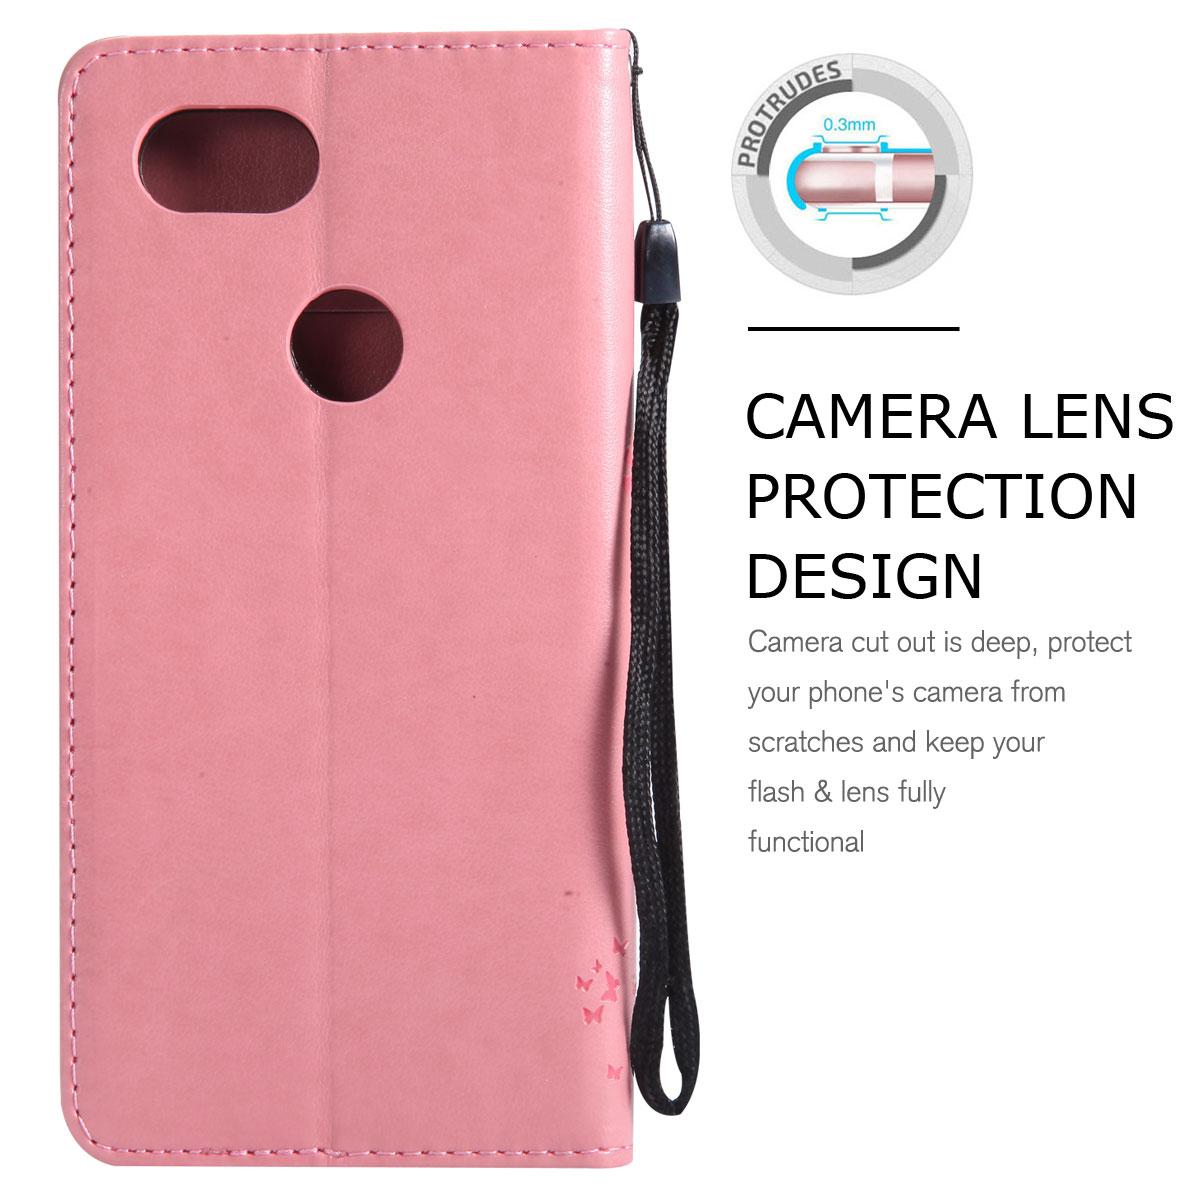 Magnetic-Leather-Credit-Card-Holder-Flip-Case-Cover-For-Google-Pixel-2-2-XL thumbnail 14